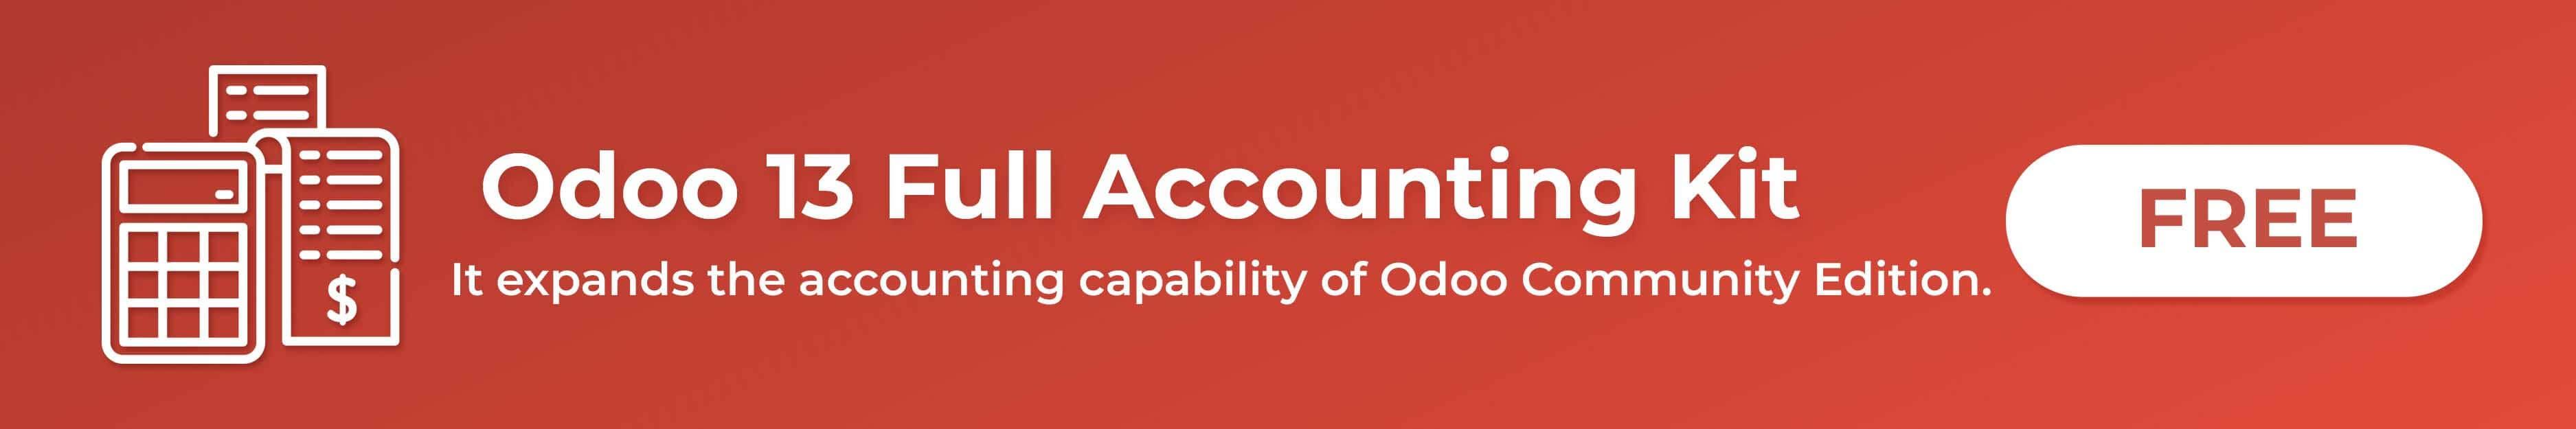 odoo 13 full accounting kit